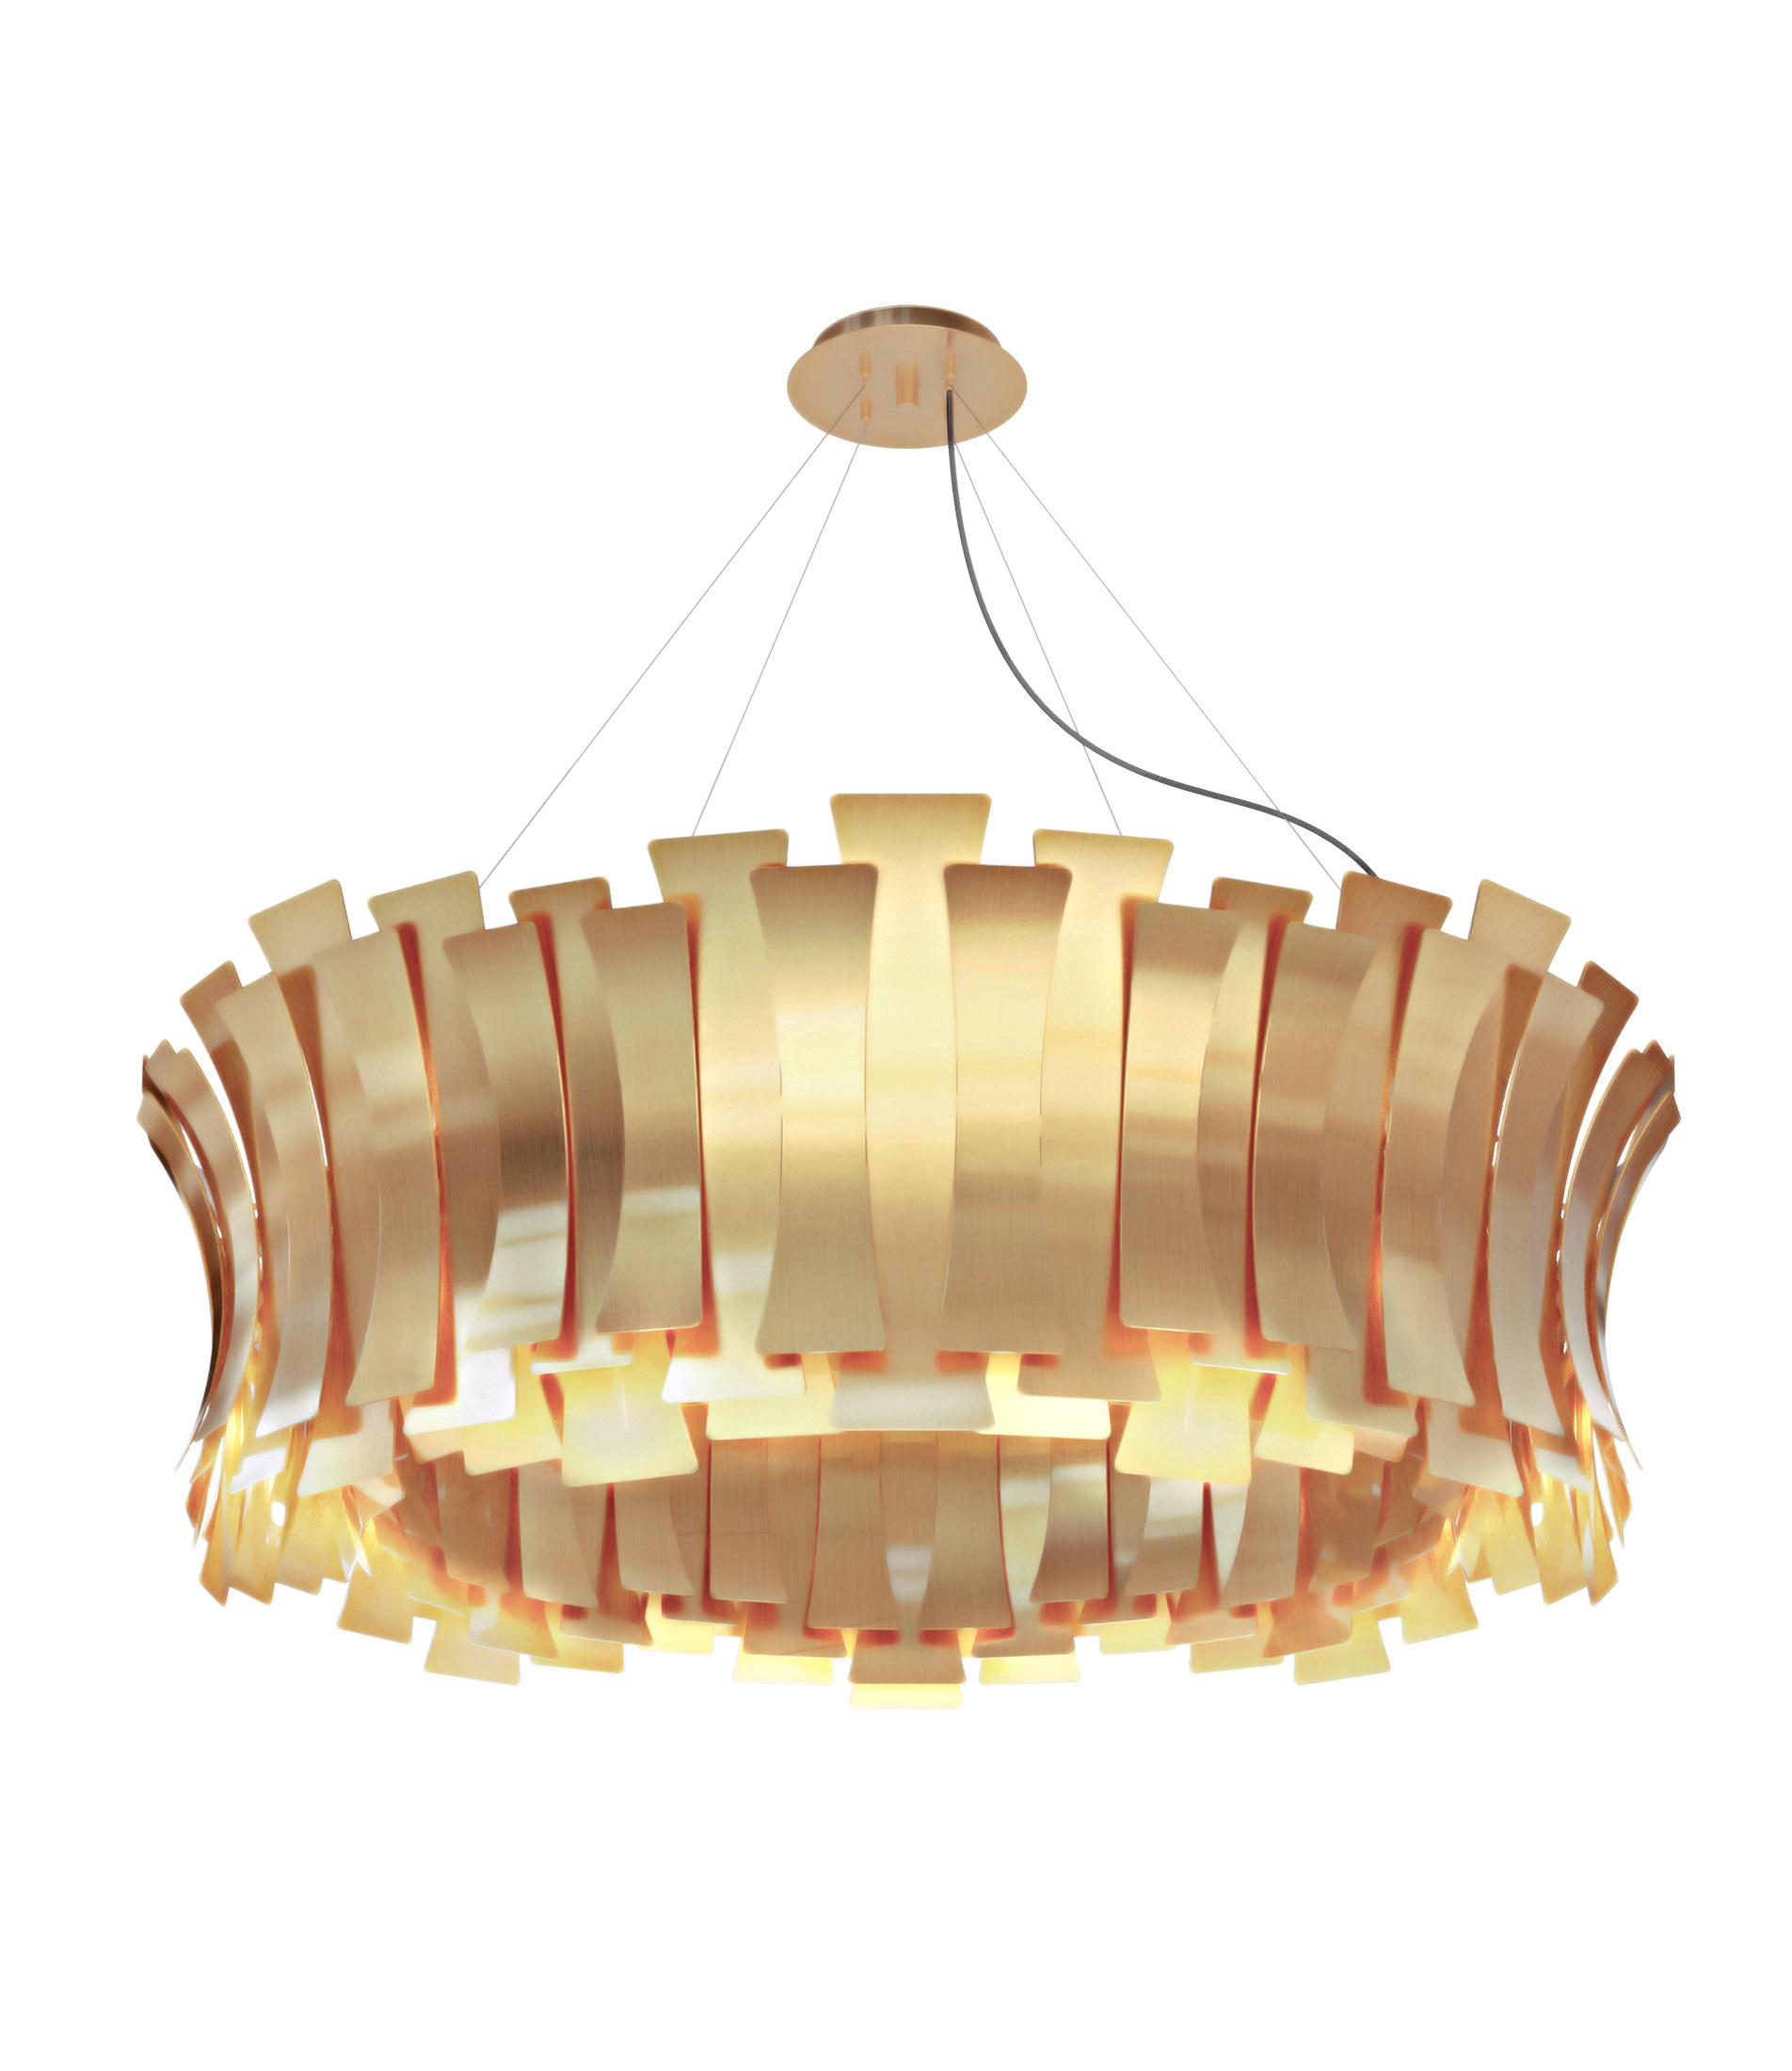 Best Contemporary Lighting- Etta Round Pendant Lamp